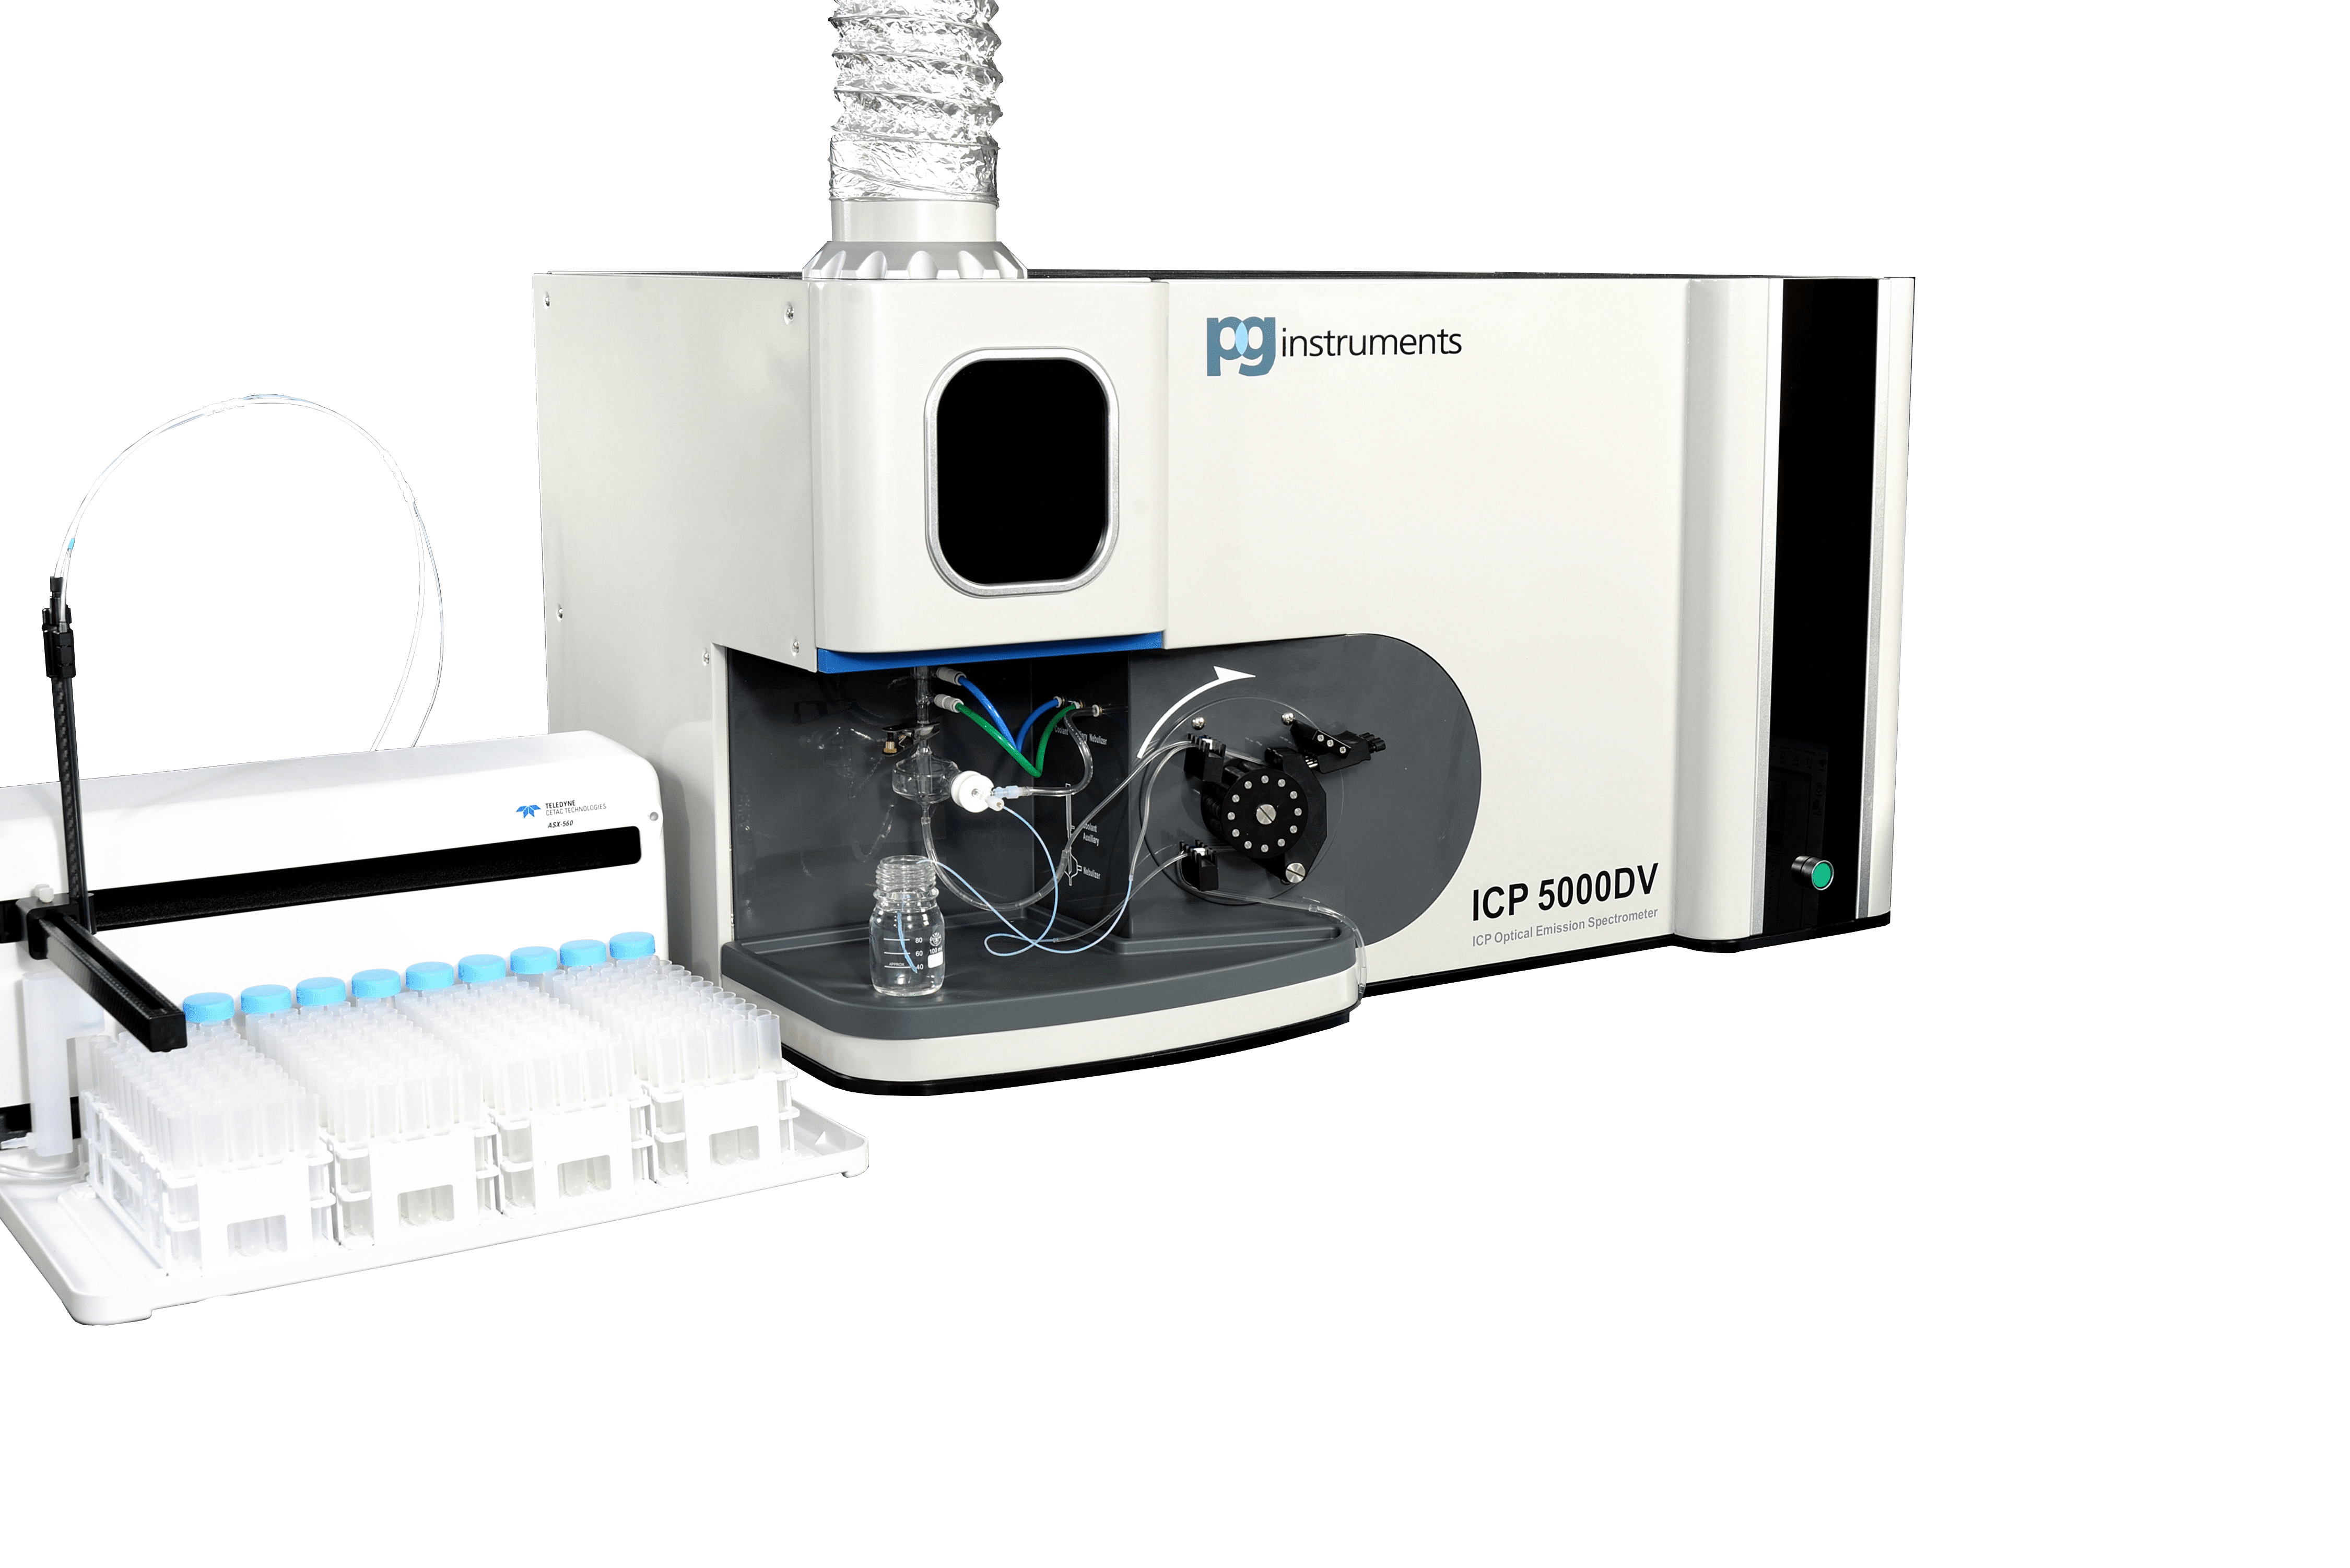 Spektrometr rownoczesny